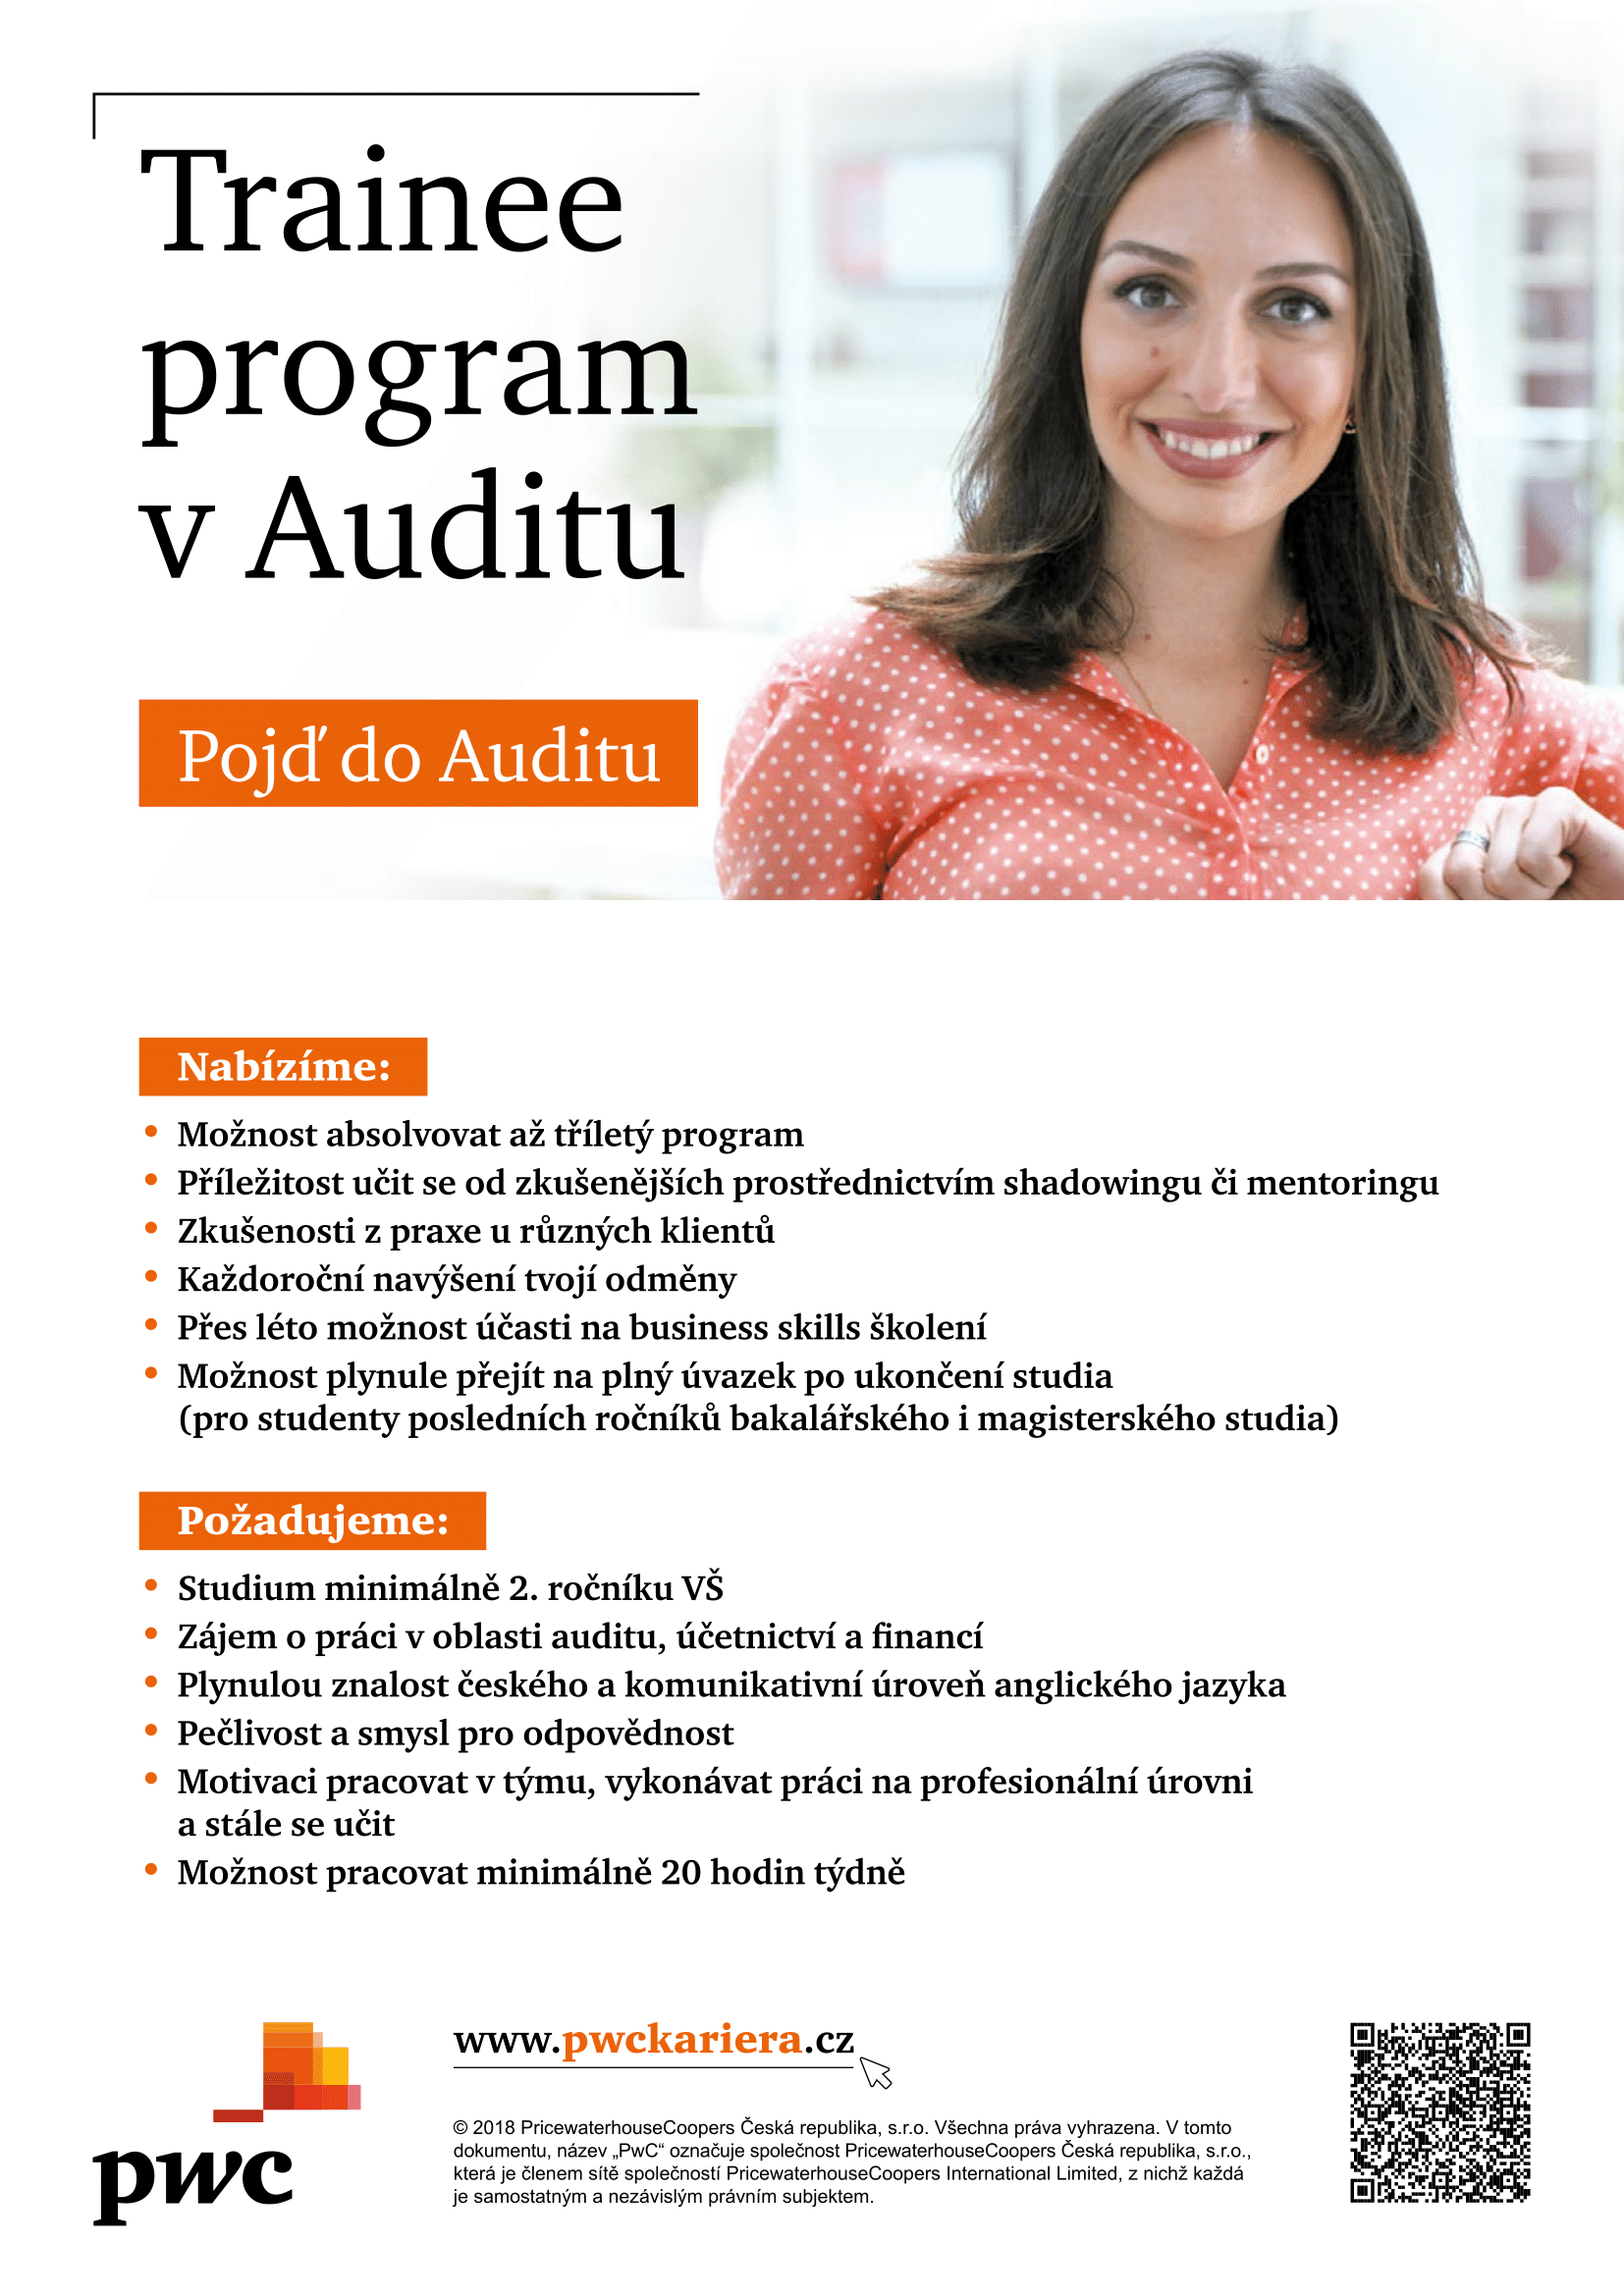 Trainee program PwC